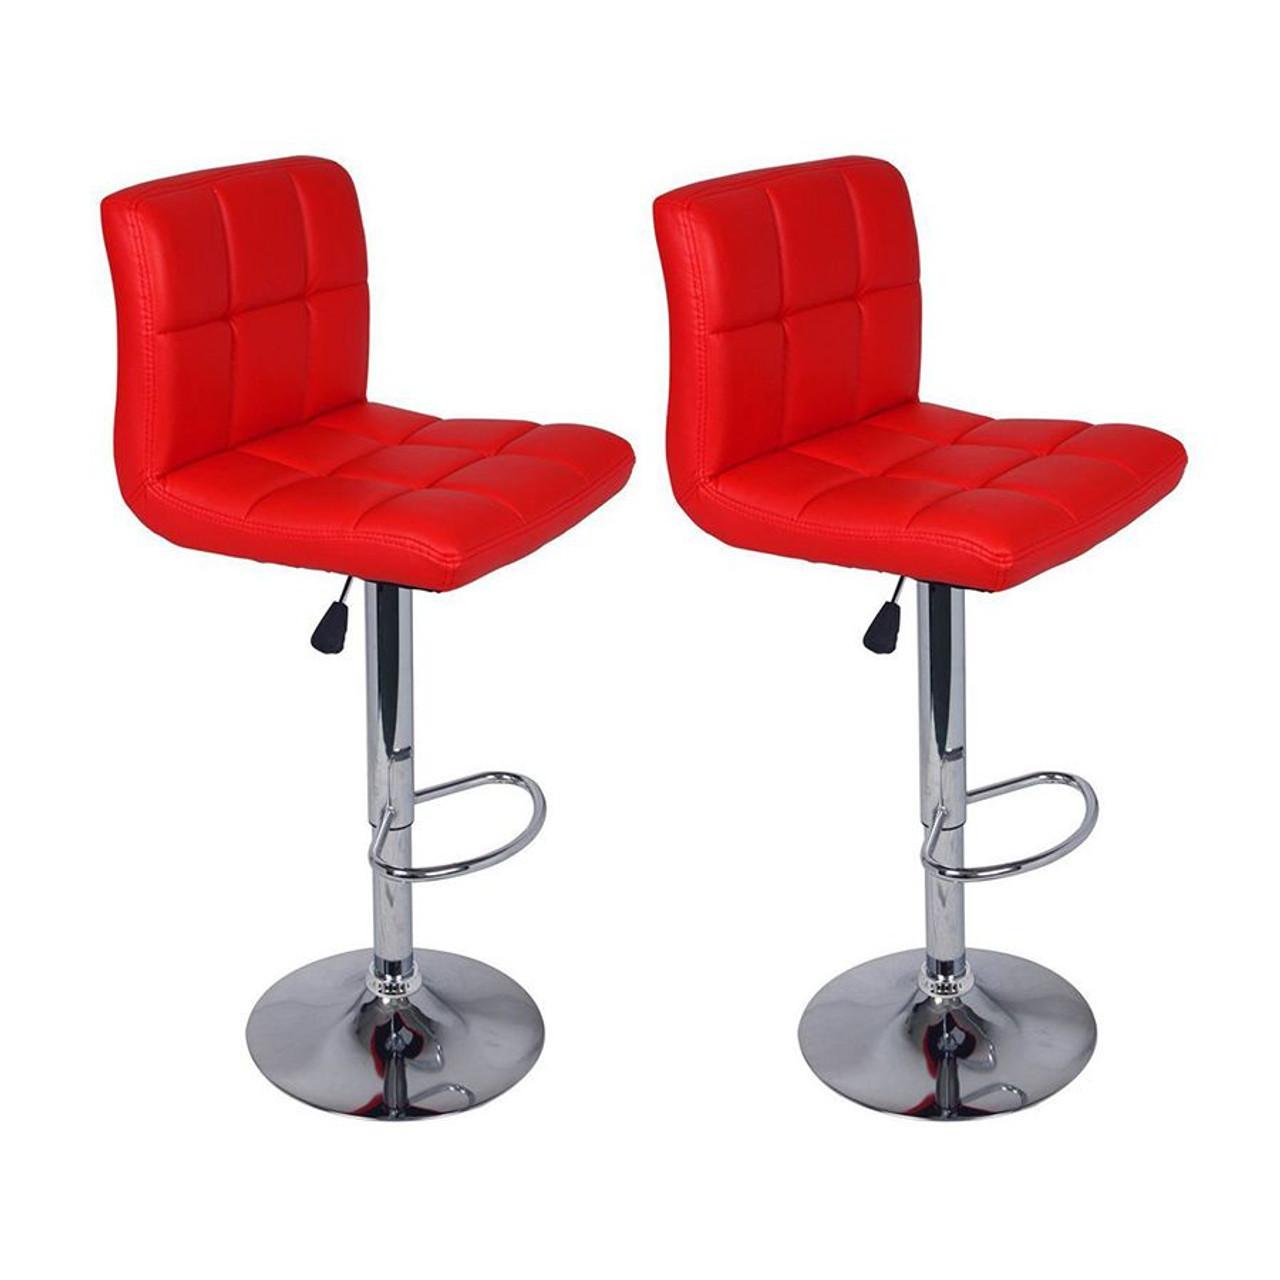 Set of 2 Adjustable Swivel Bar Stools  Red Color